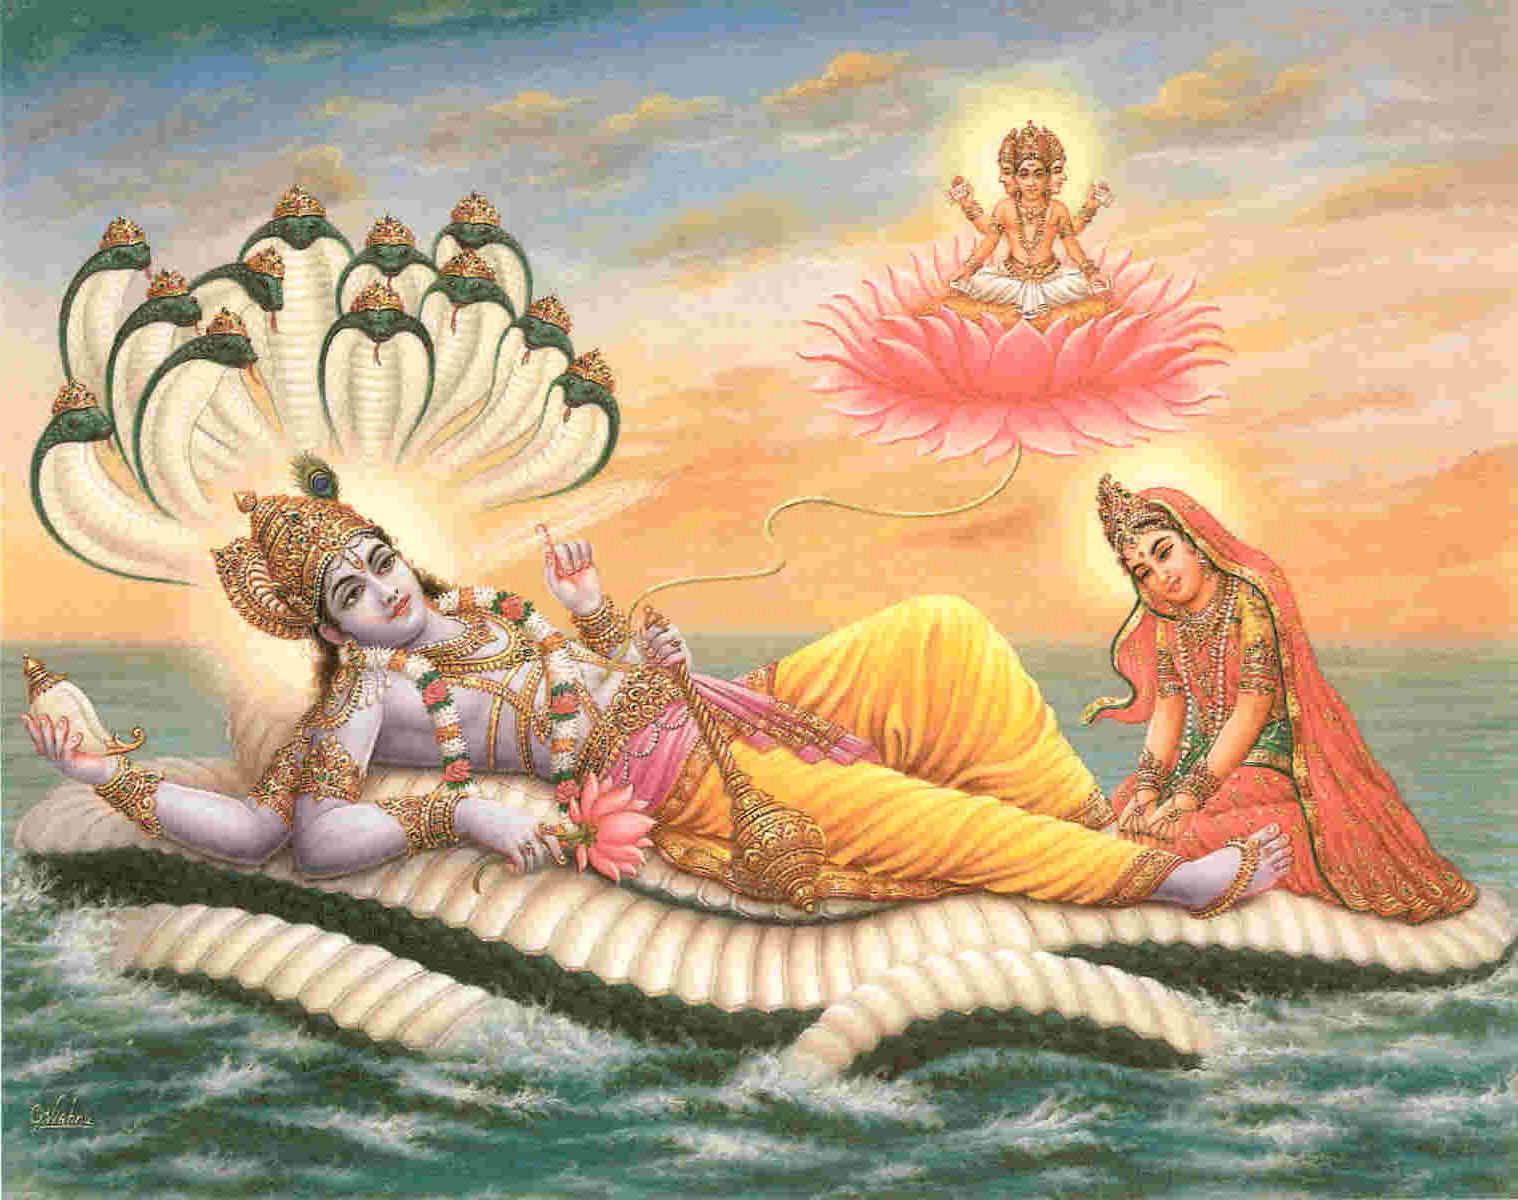 The Hindu god Vishnu is the